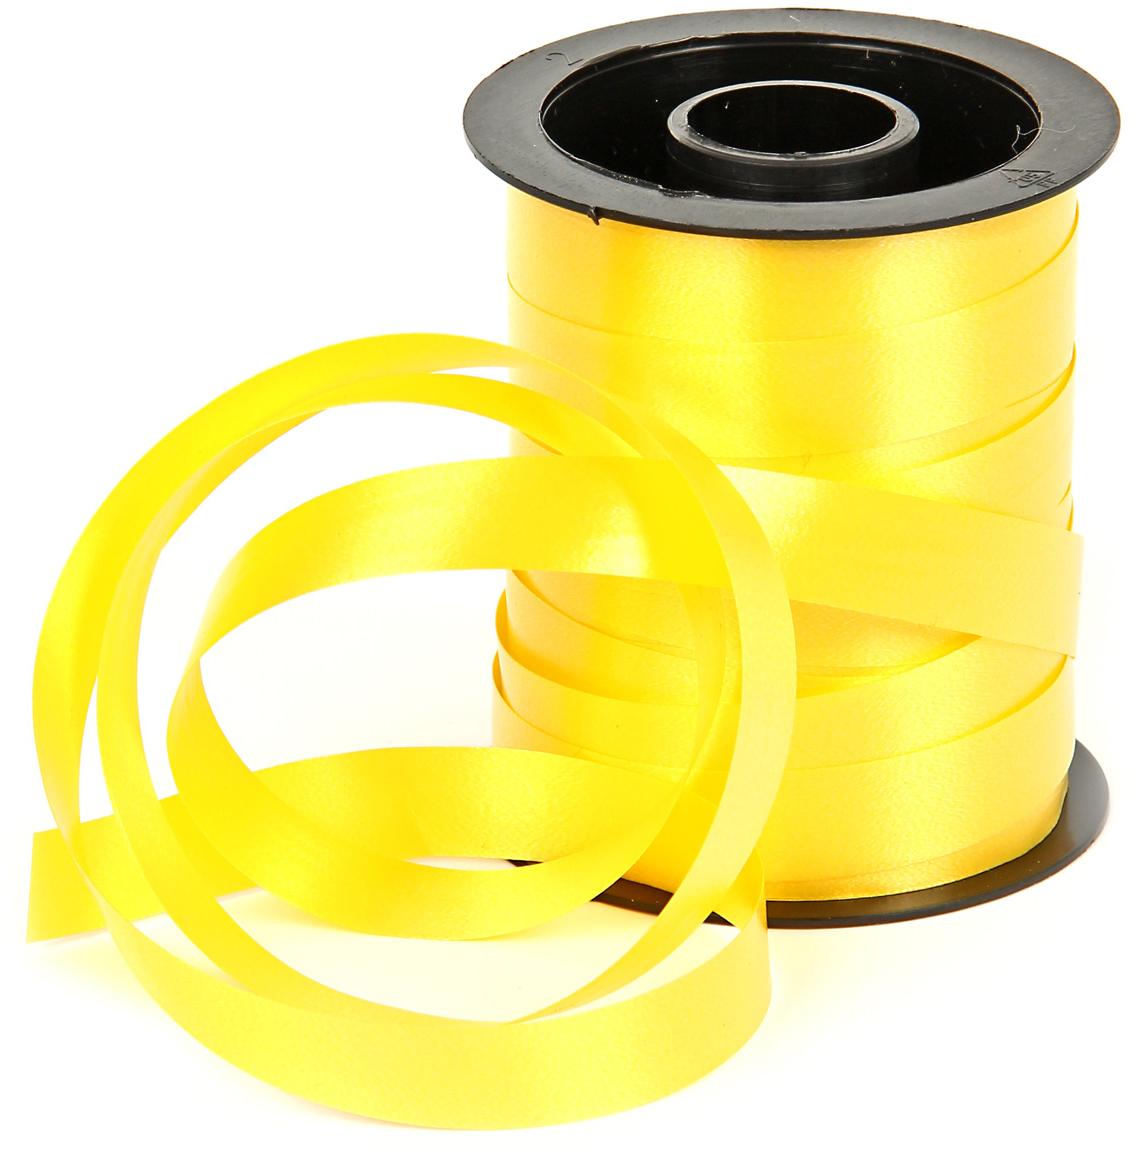 Лента декоративная Veld-Co, цвет: желтый, 1 см х 10 м набор подарочных коробок veld co грезы путешественника 11 шт